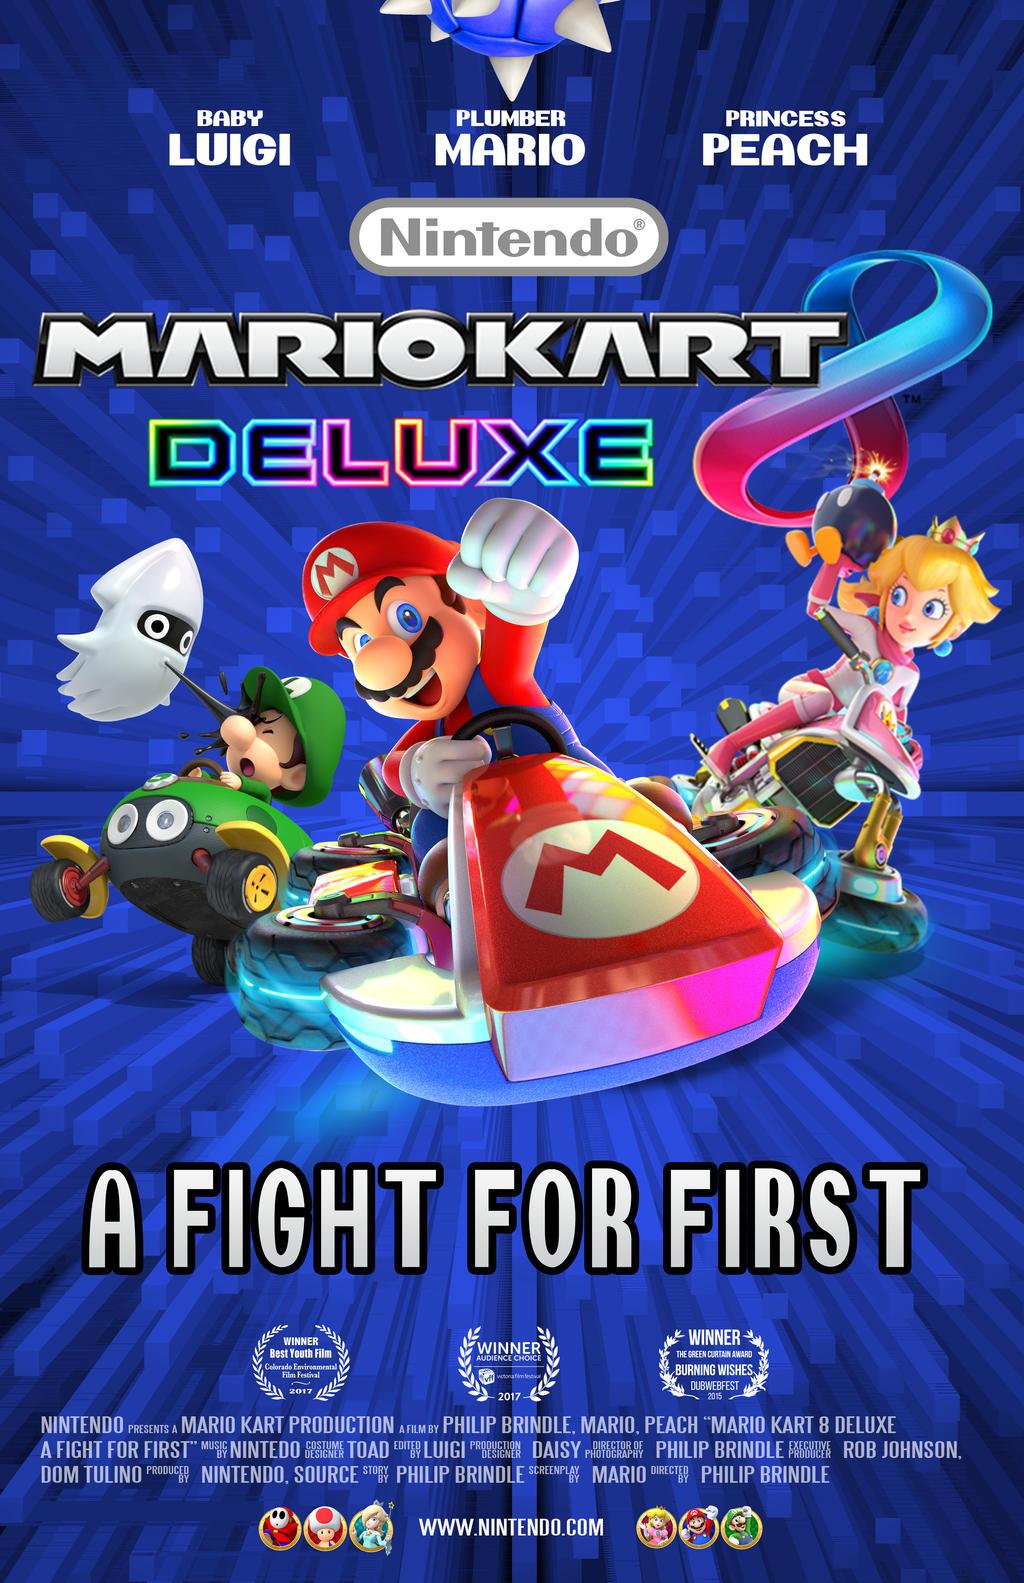 Nintendo Mario Kart 8 Deluxe Movie Poster By Mawsmile On Deviantart